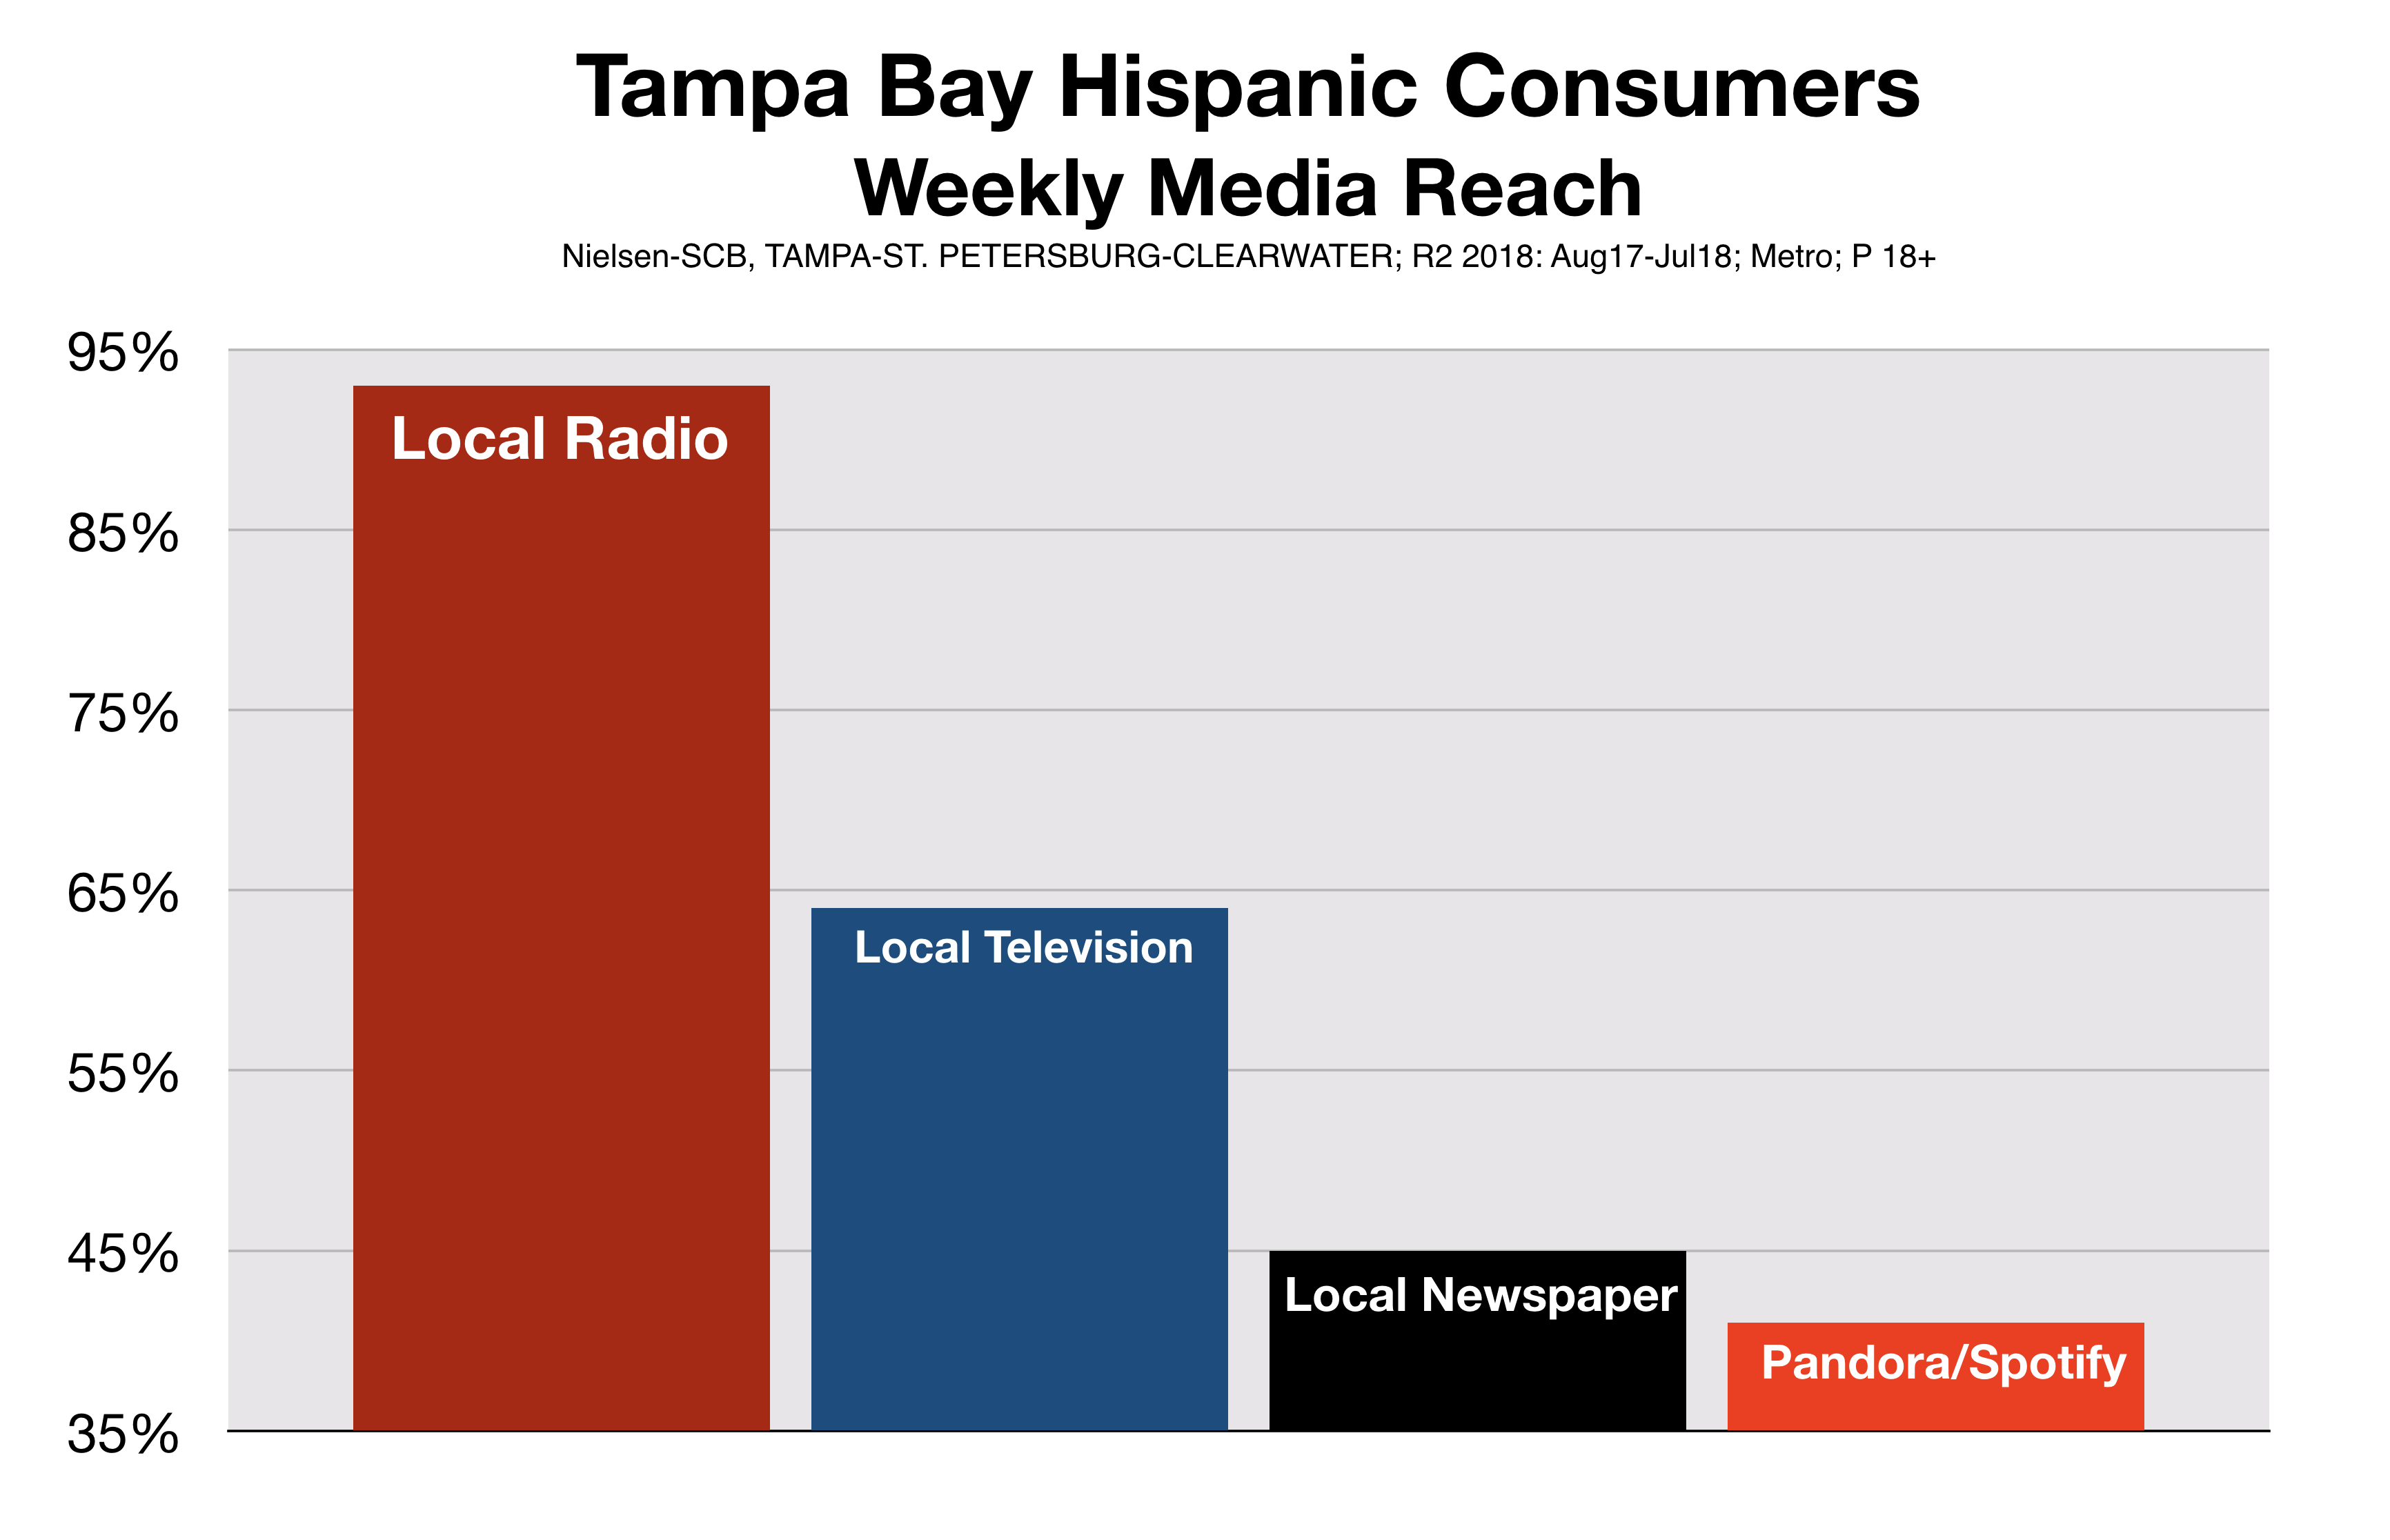 Hispanic Consumer Reach Advertising in Tampa Bay